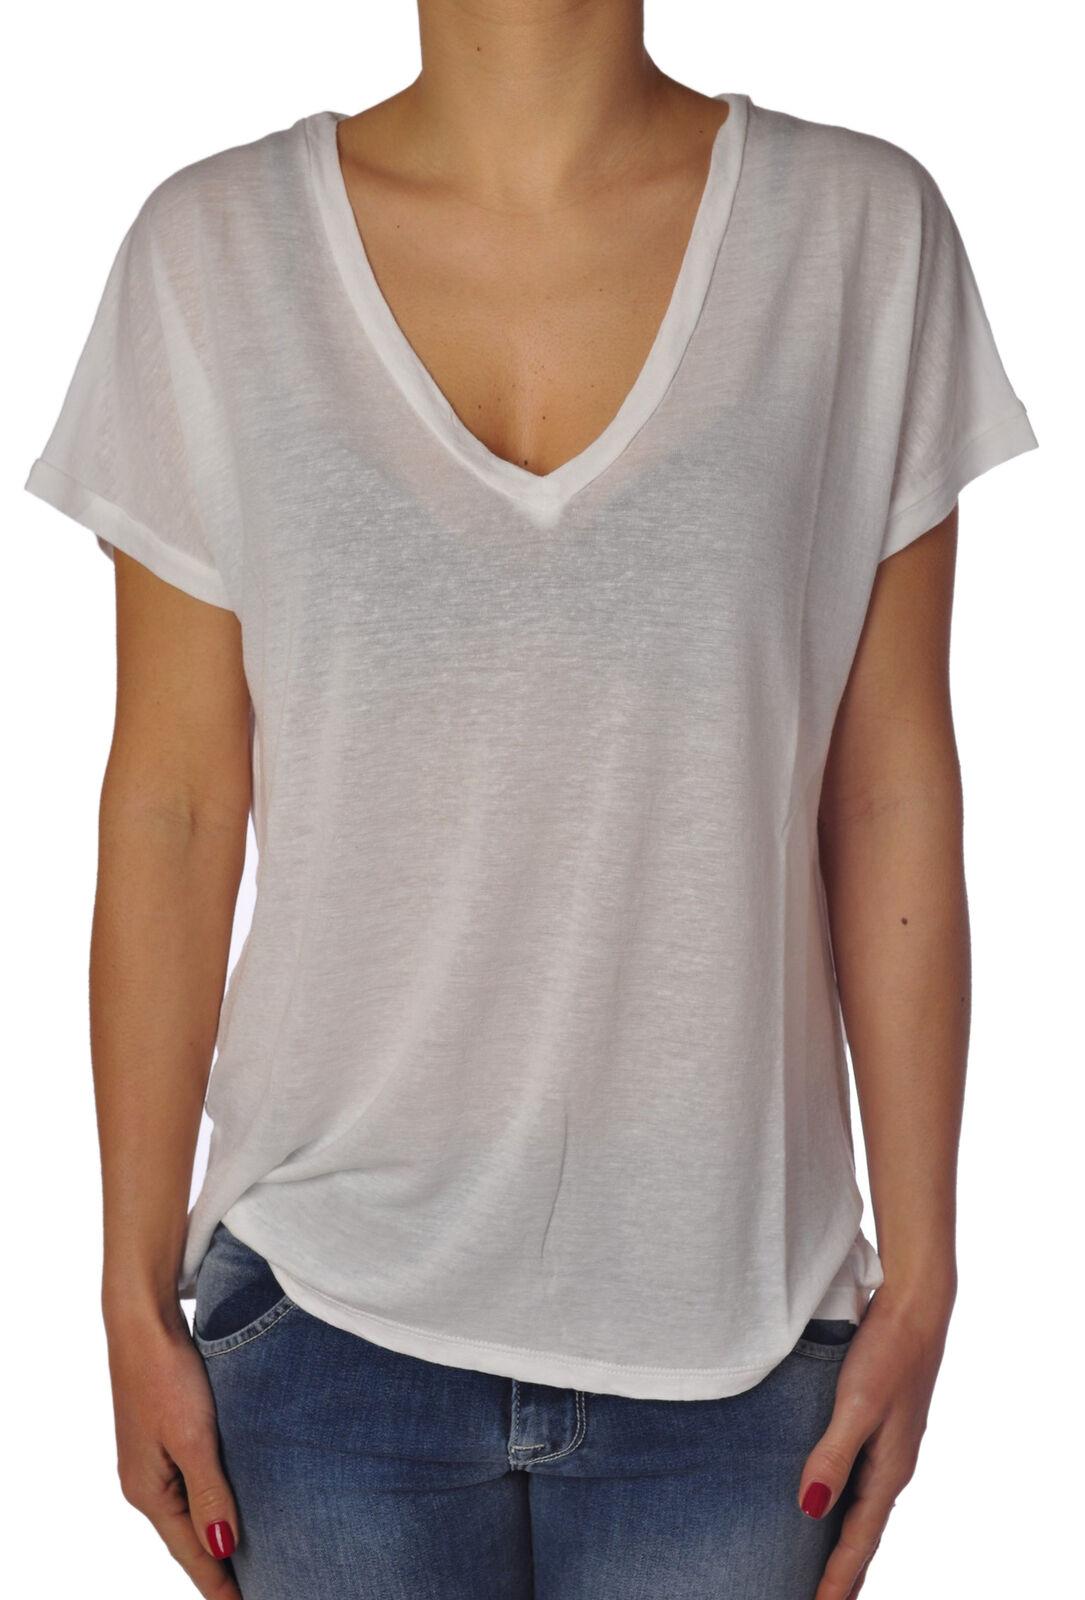 Soallure - Topwear-T-shirts - woman - 774317C184314